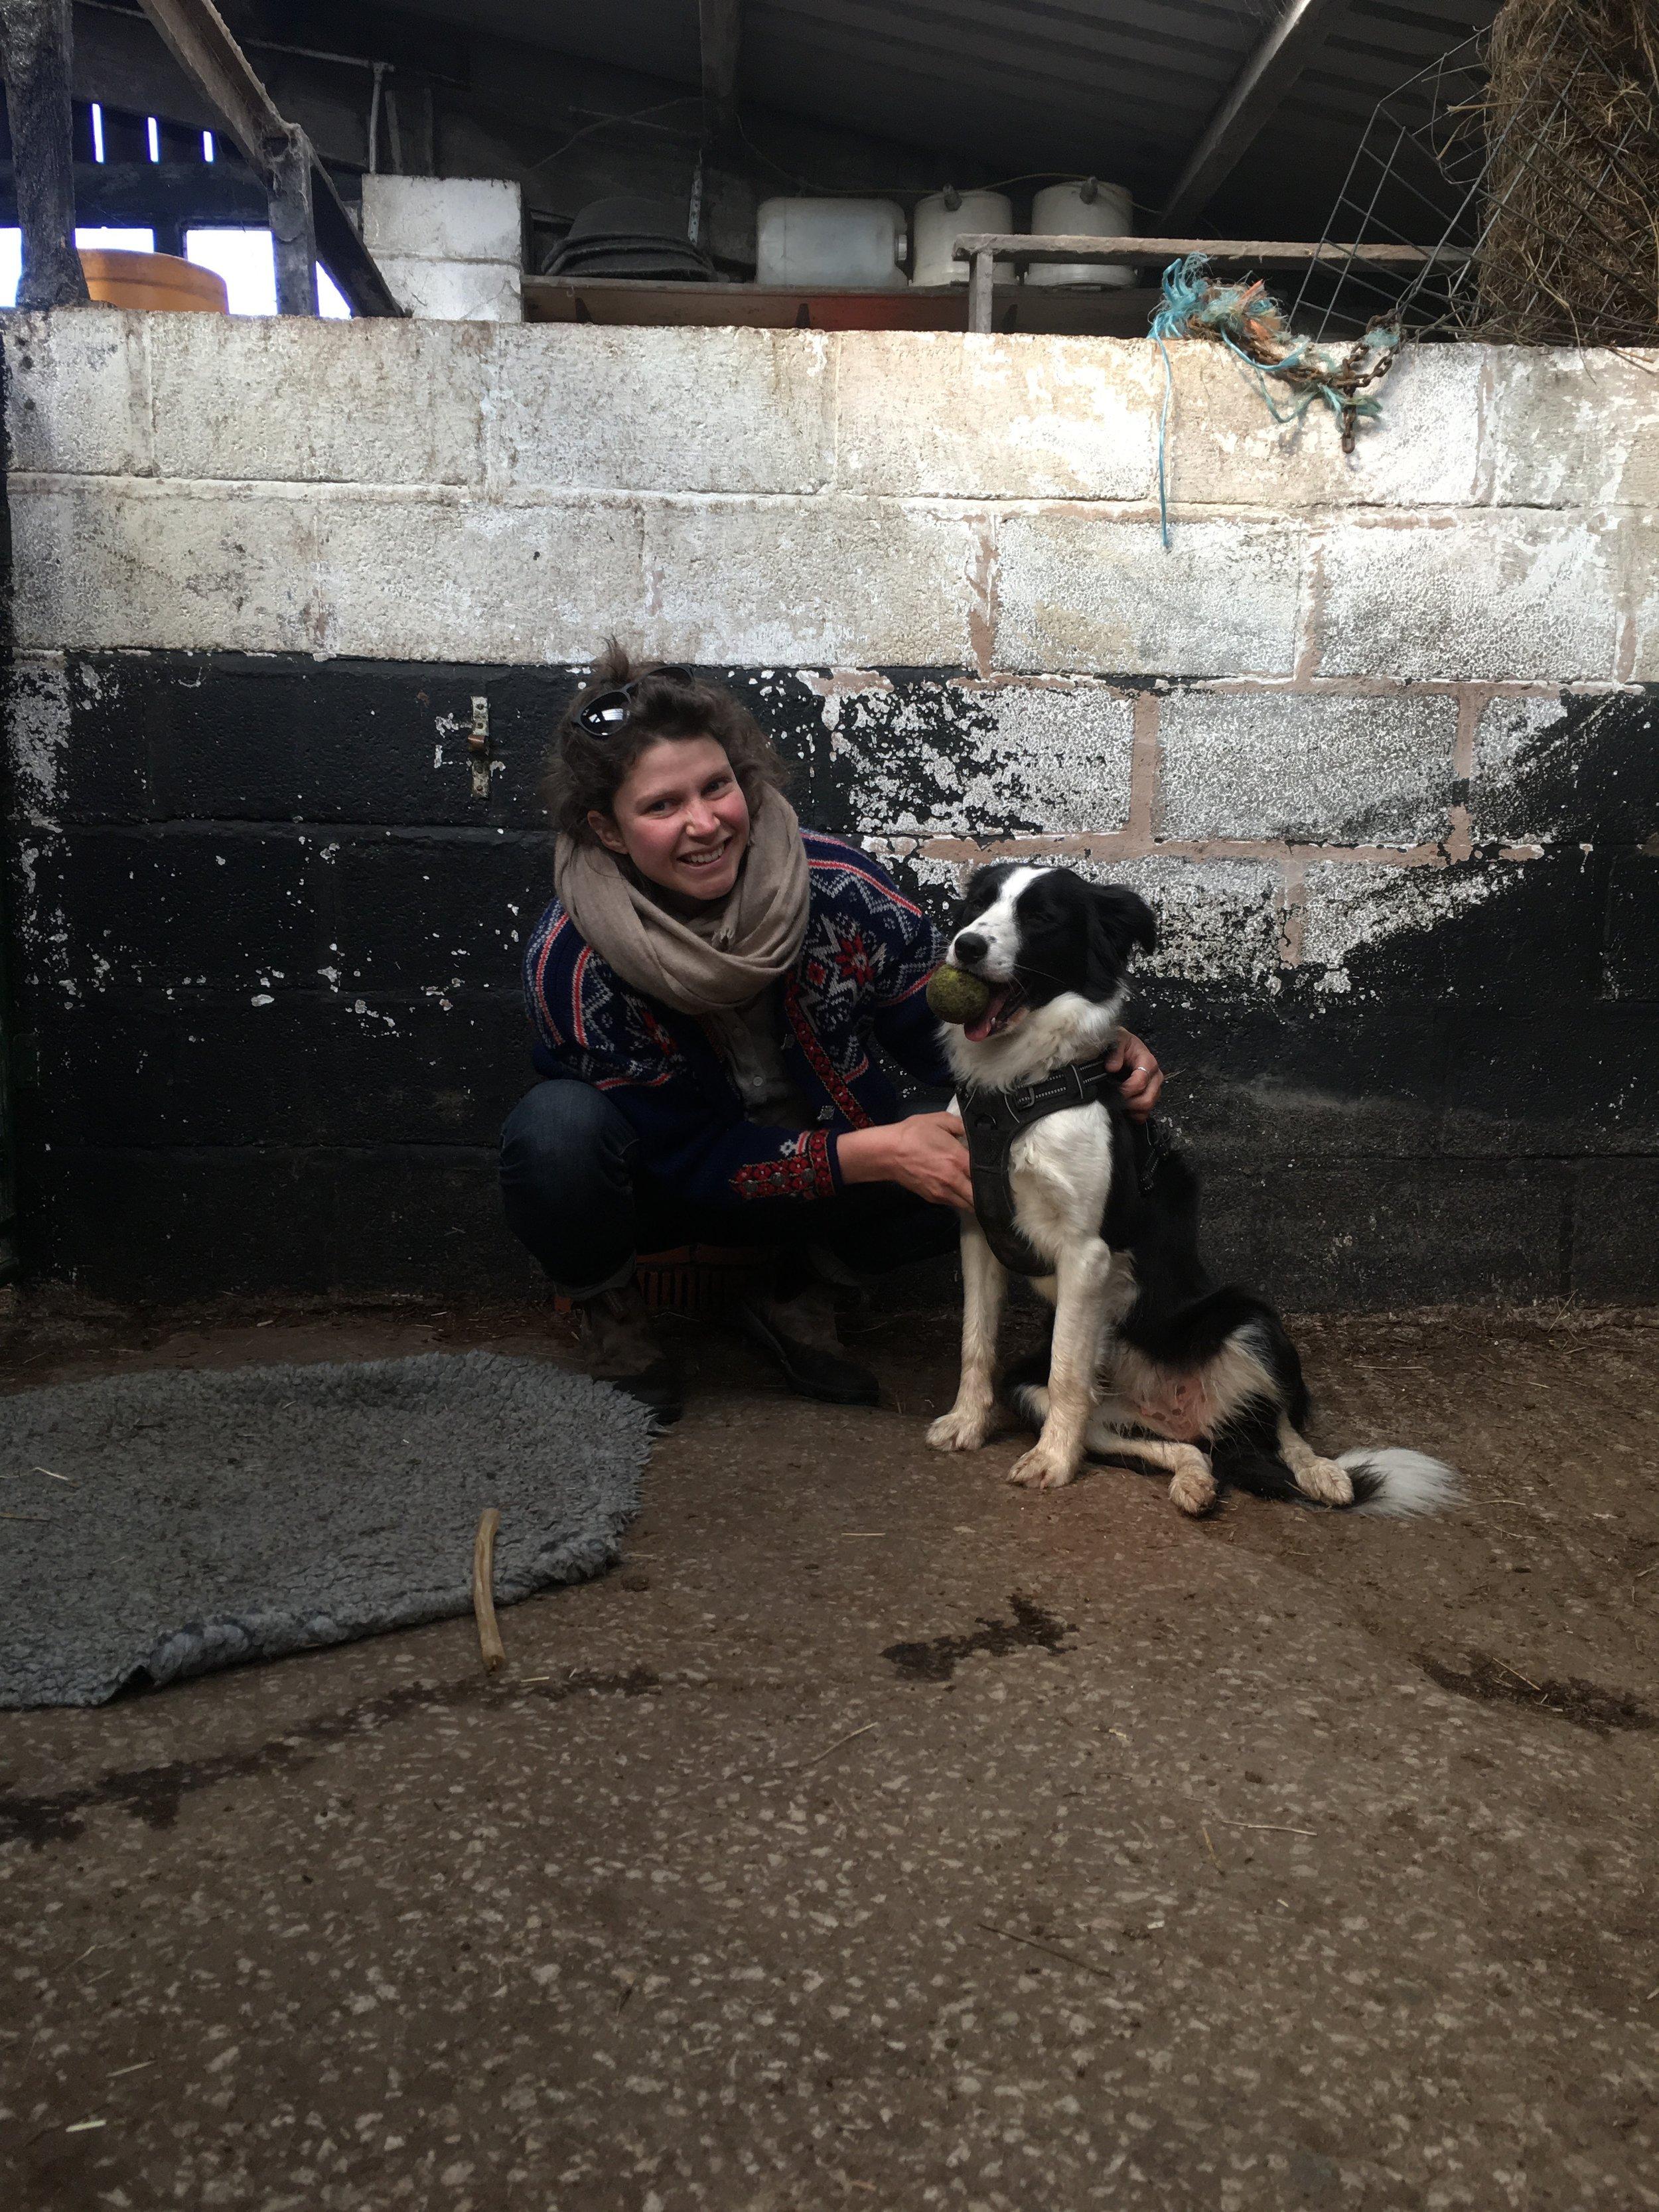 Me and Pip at Cronkshaw Fold Farm